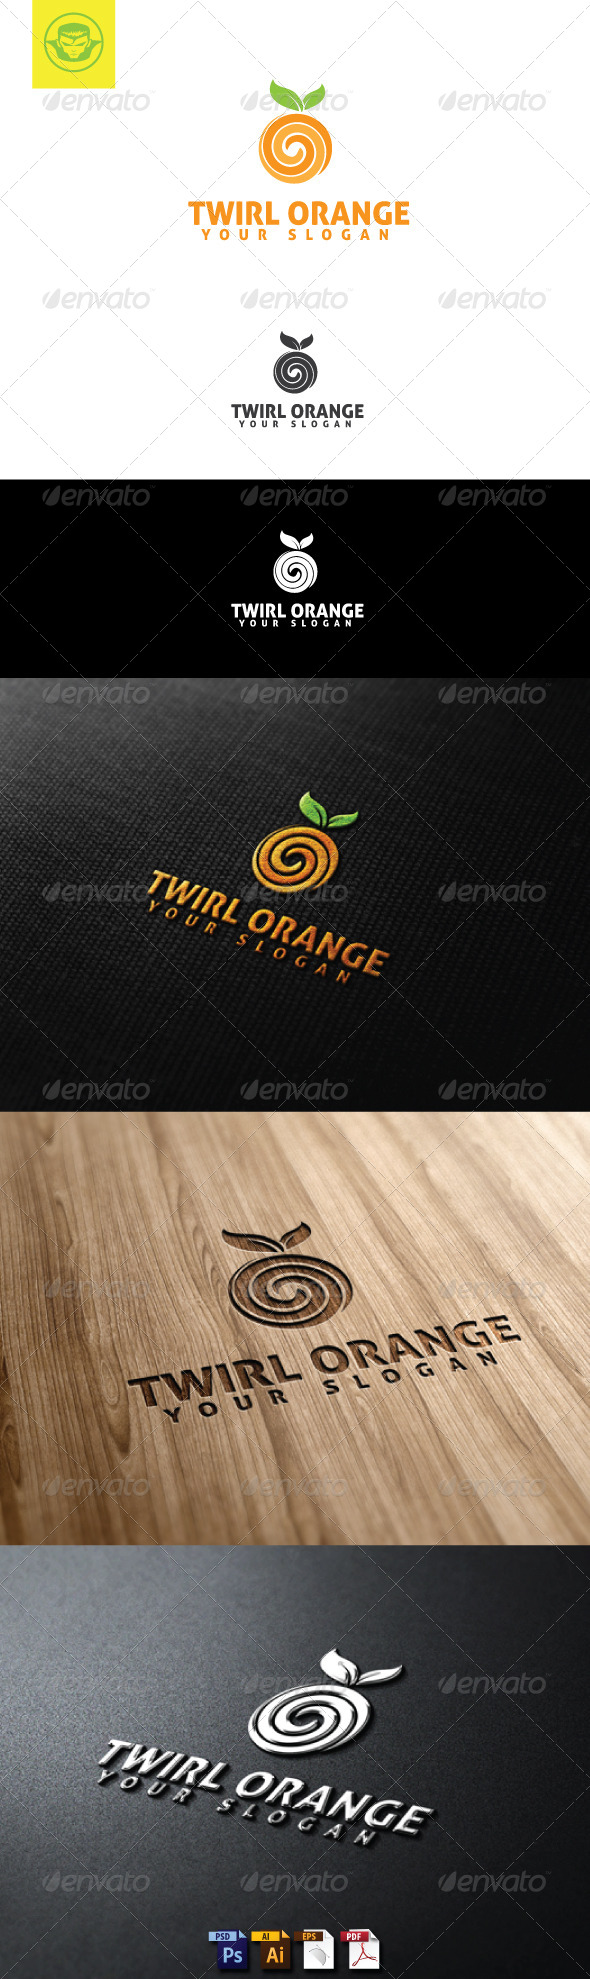 GraphicRiver Twirl Orange Logo Template 5107340